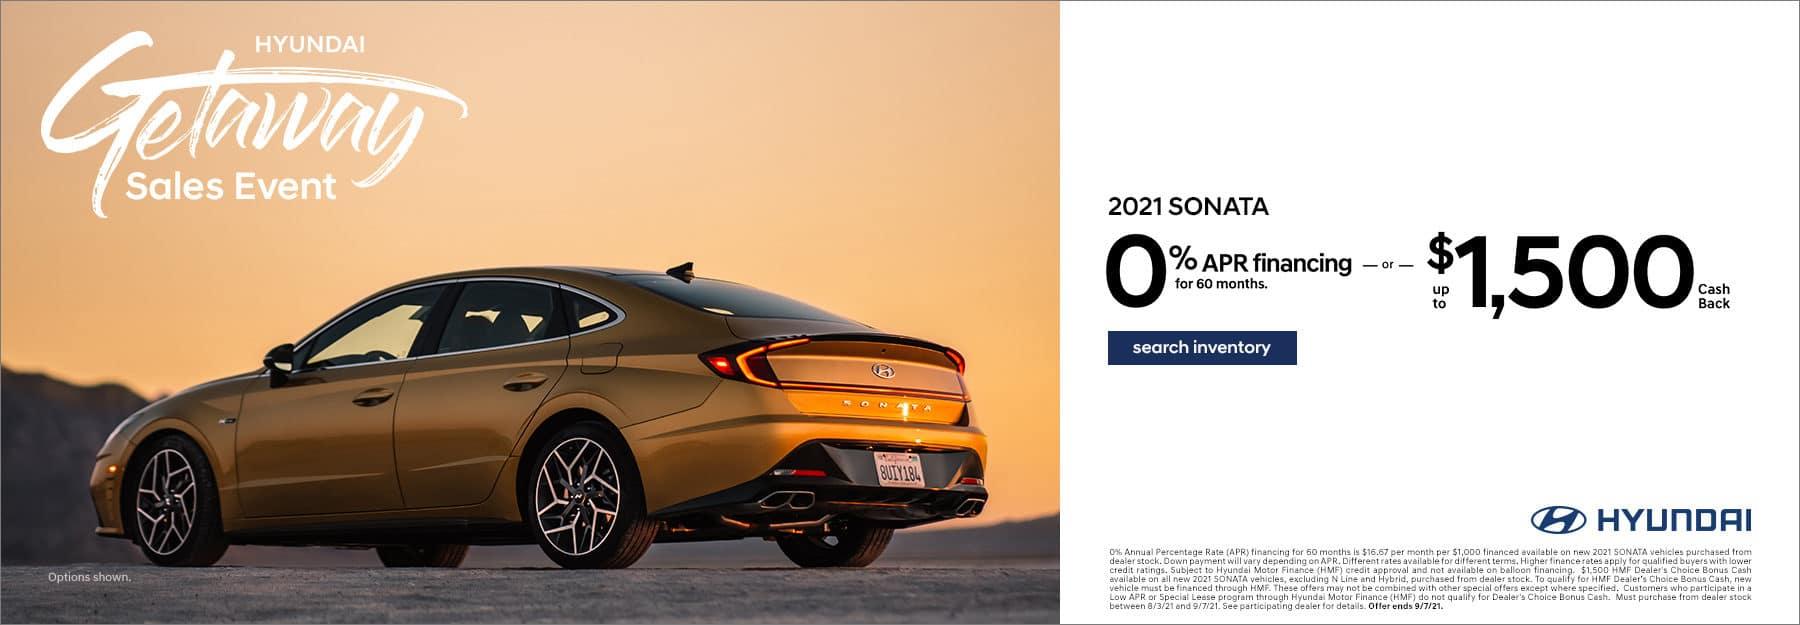 2021 Hyundai Sonata 0% 60mo